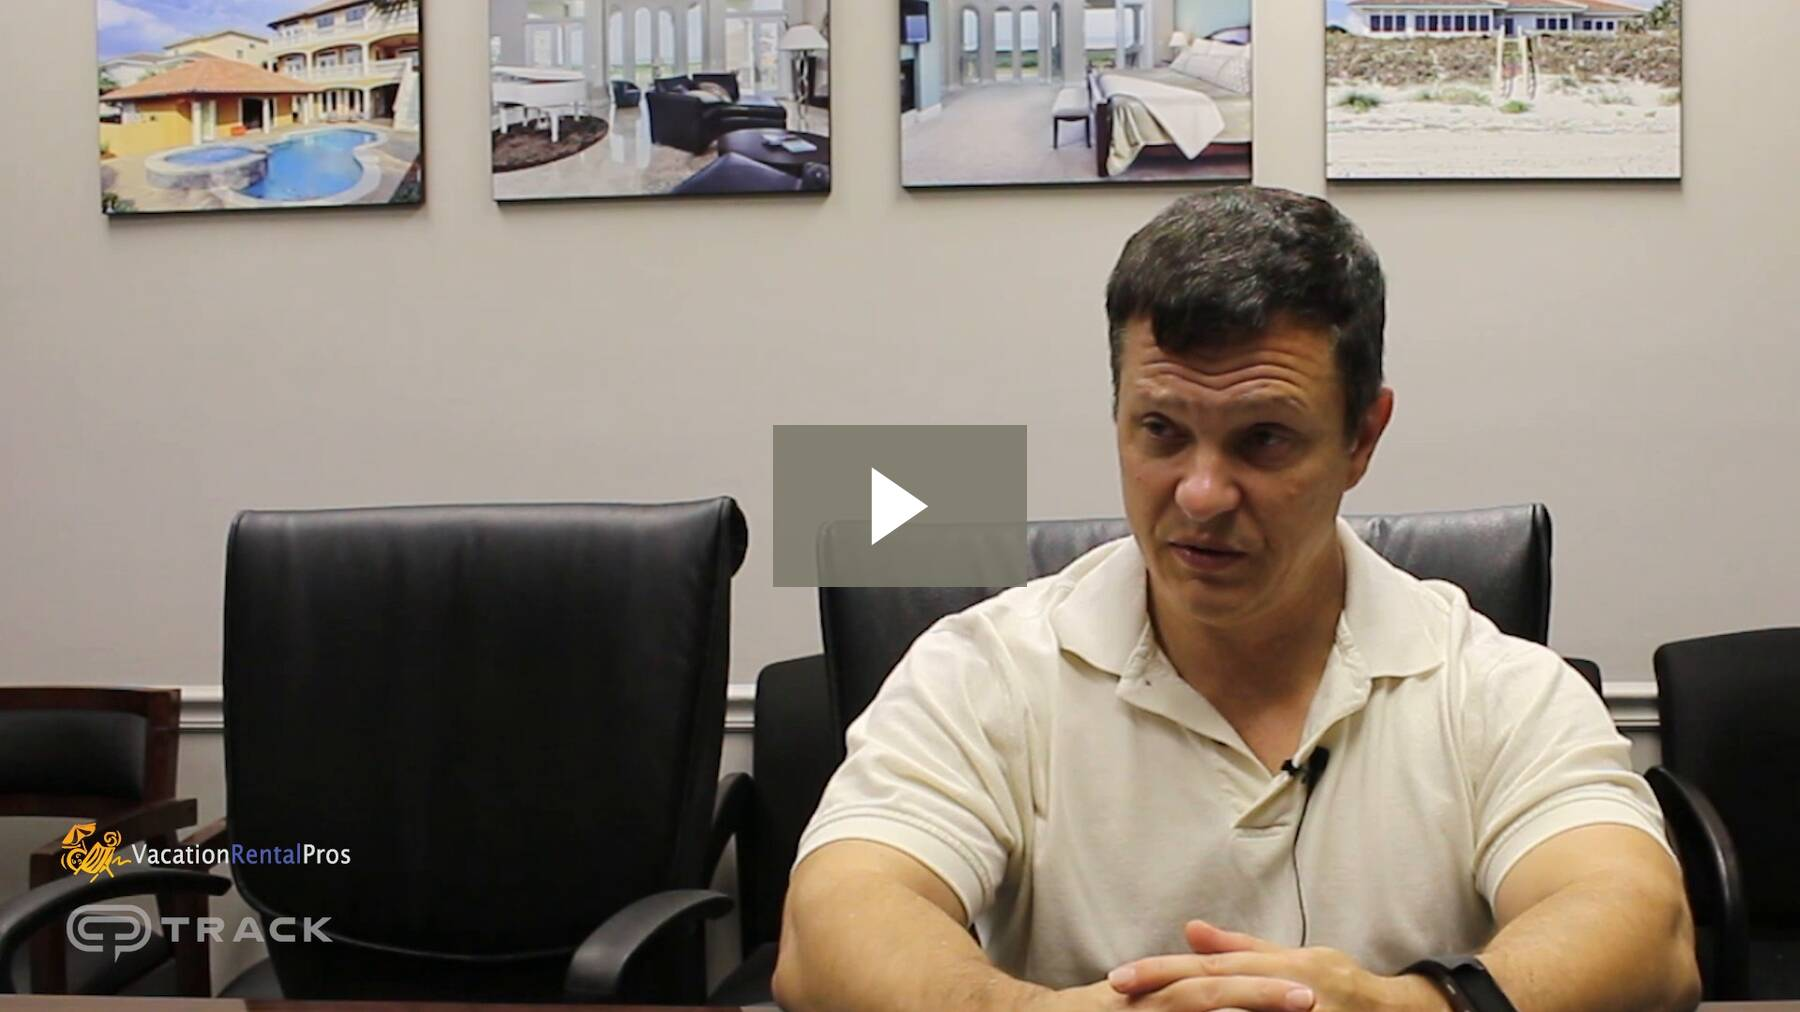 Success Stories- Vacation Rental Pros- Steve Milo